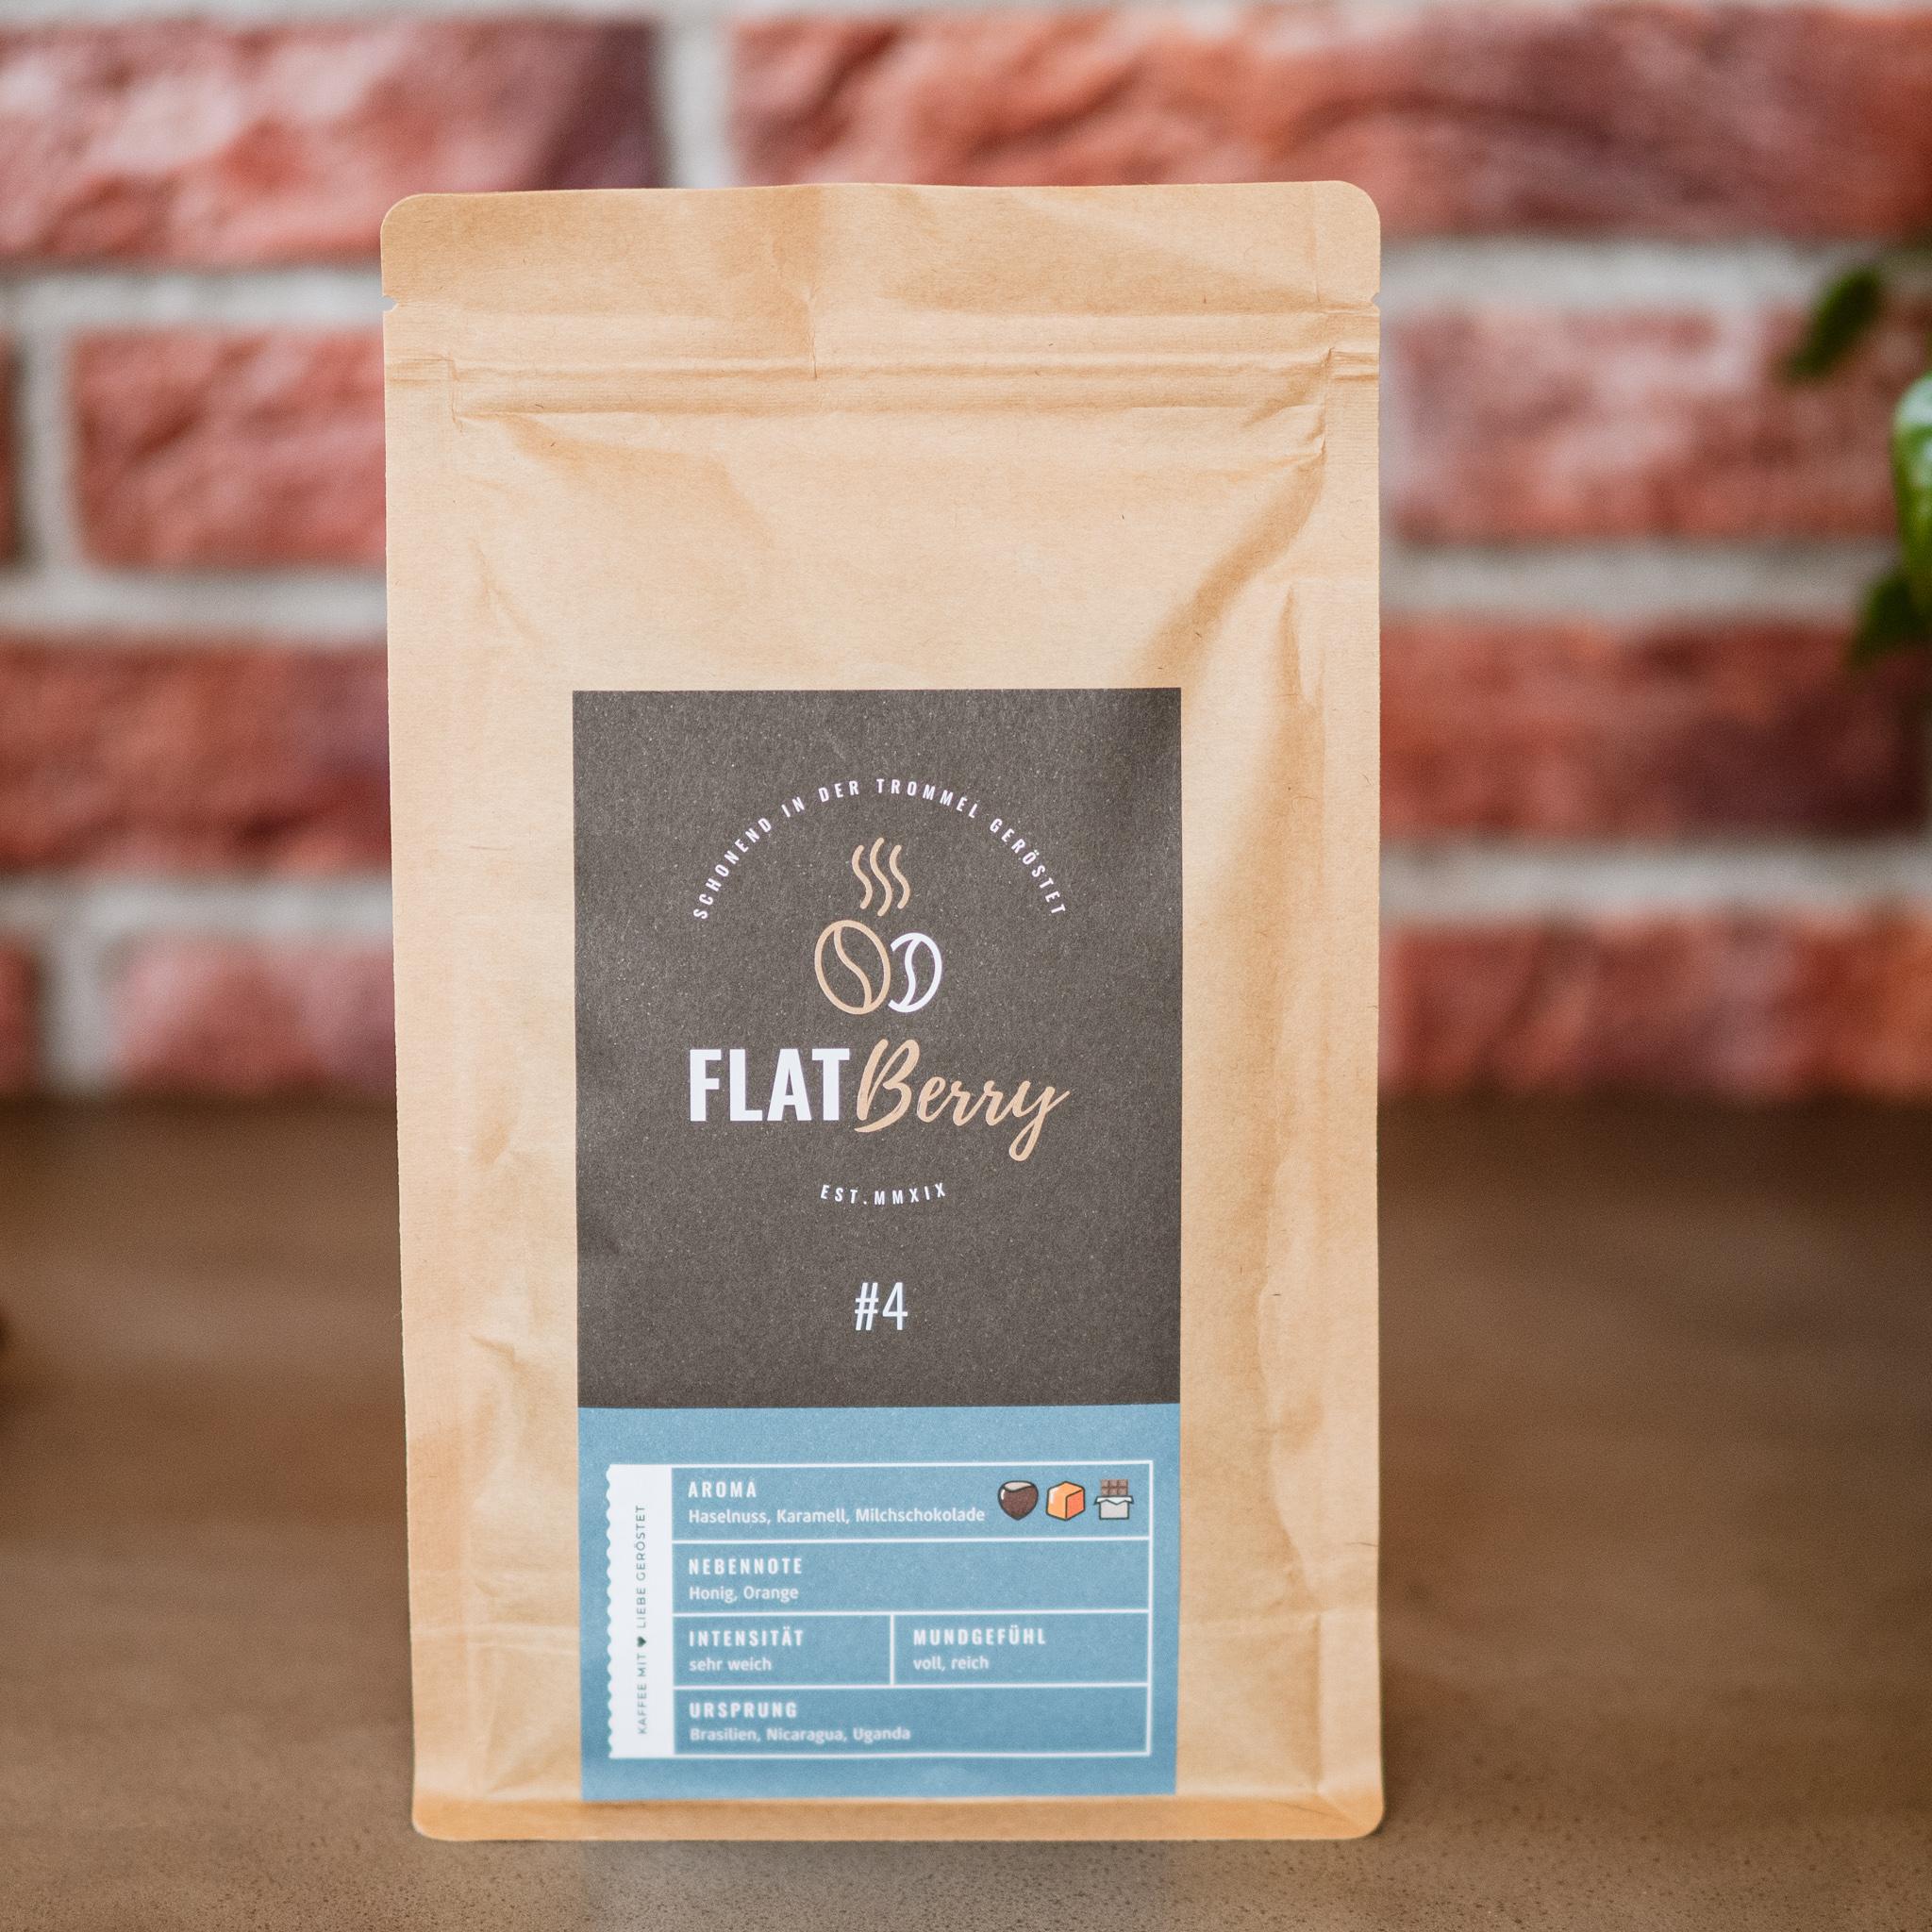 Flatberry Kaffee 4 karamellig Vollautomat